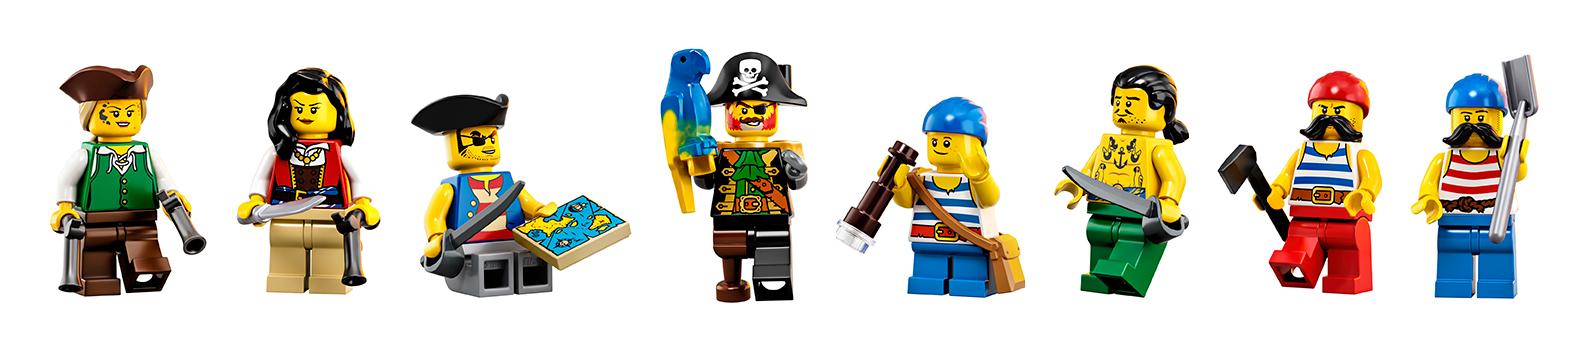 Pirates of Barracuda Bay minifigures